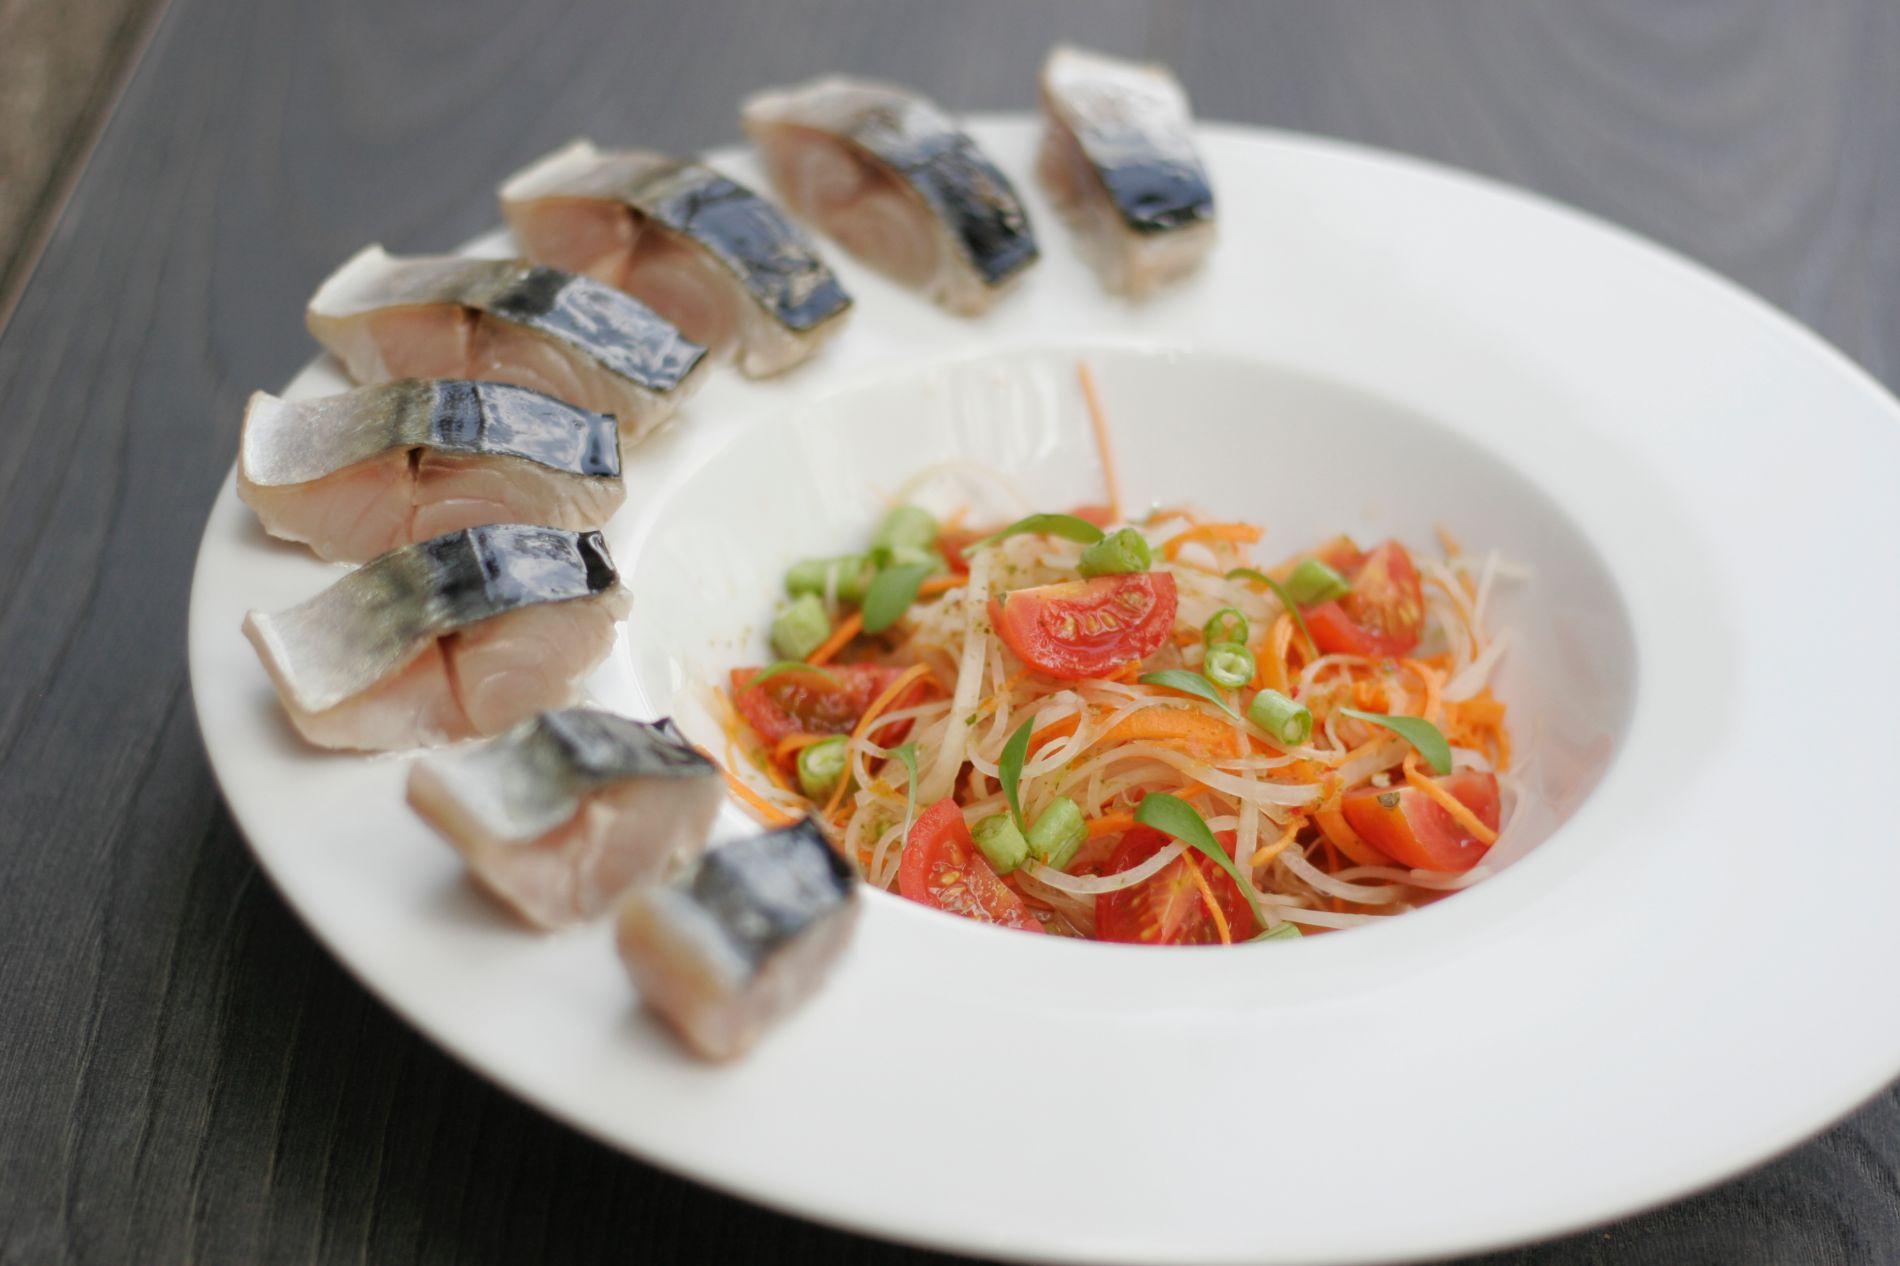 La ensalada 'thai' con caballa curada es perfecta para compartir. Foto: Fizz.